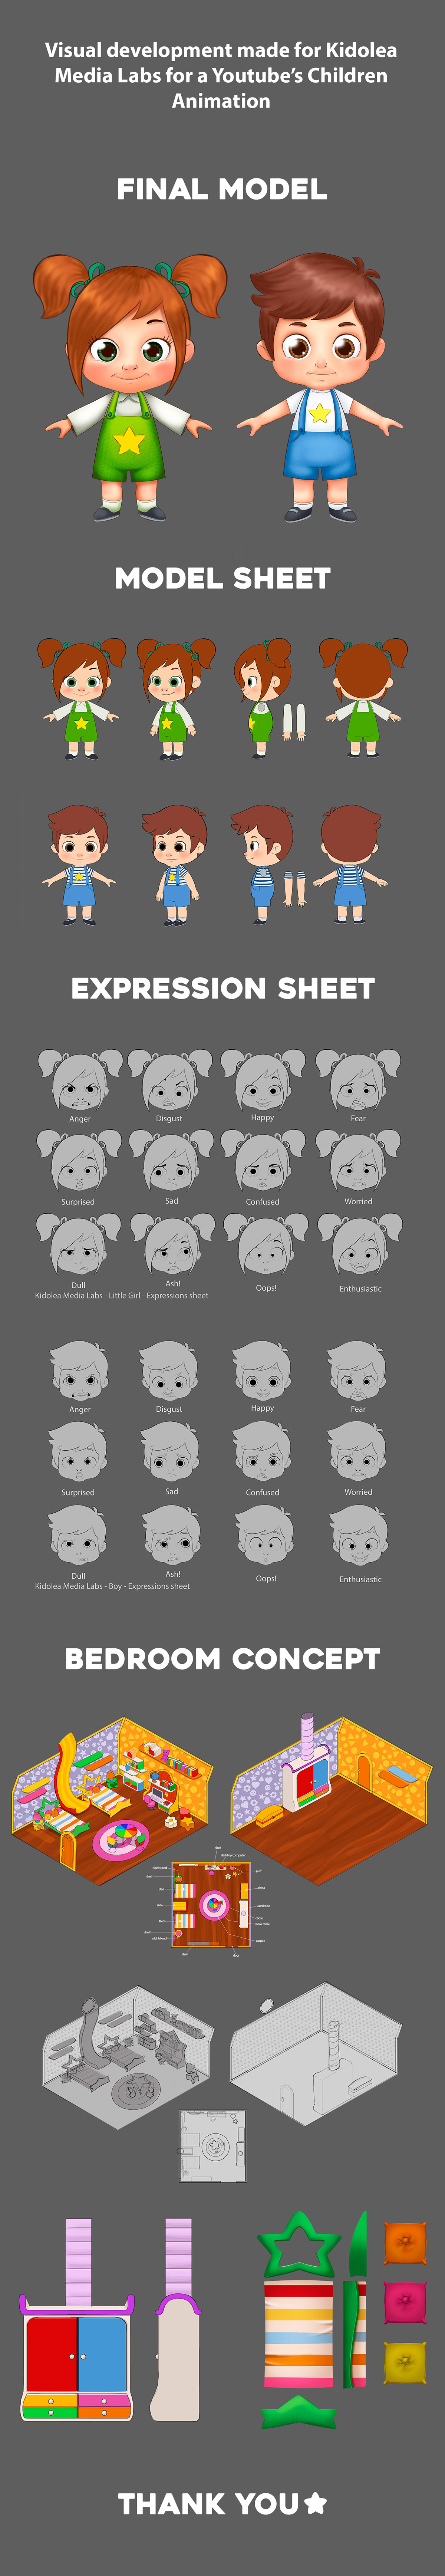 animation  ChildrenIllustration conceptart visualdev visualdevelopment